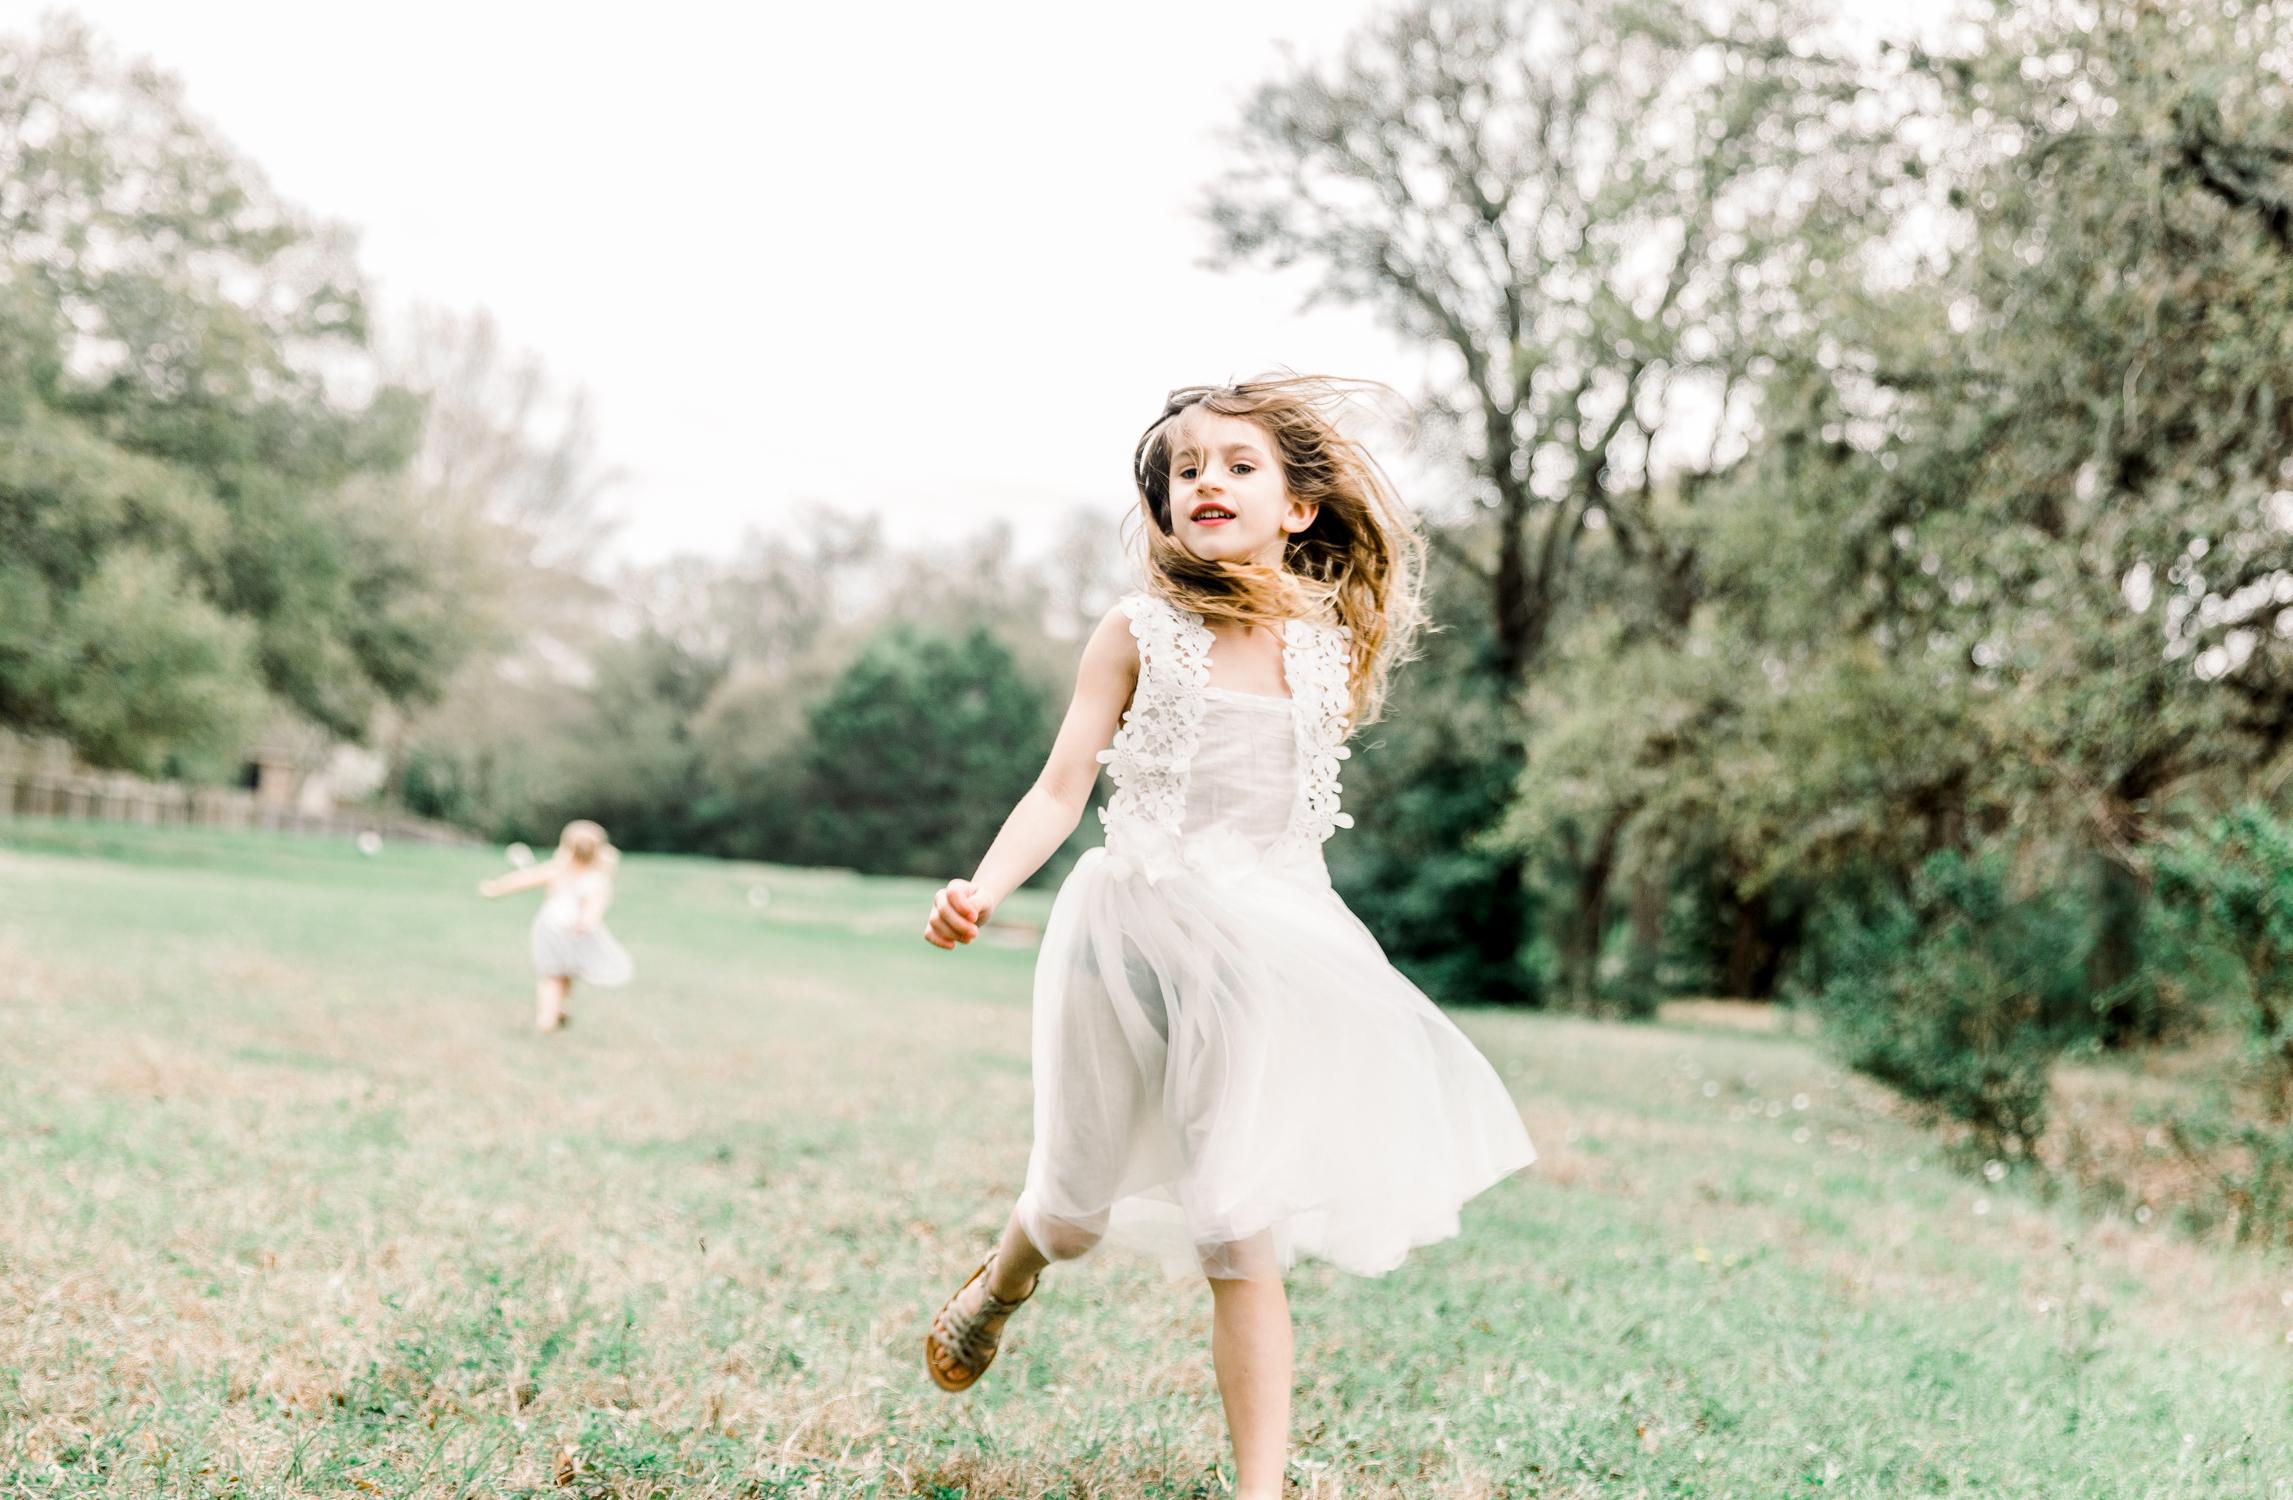 lifestyle-family-photographer-franklin-tea-time-18.jpg